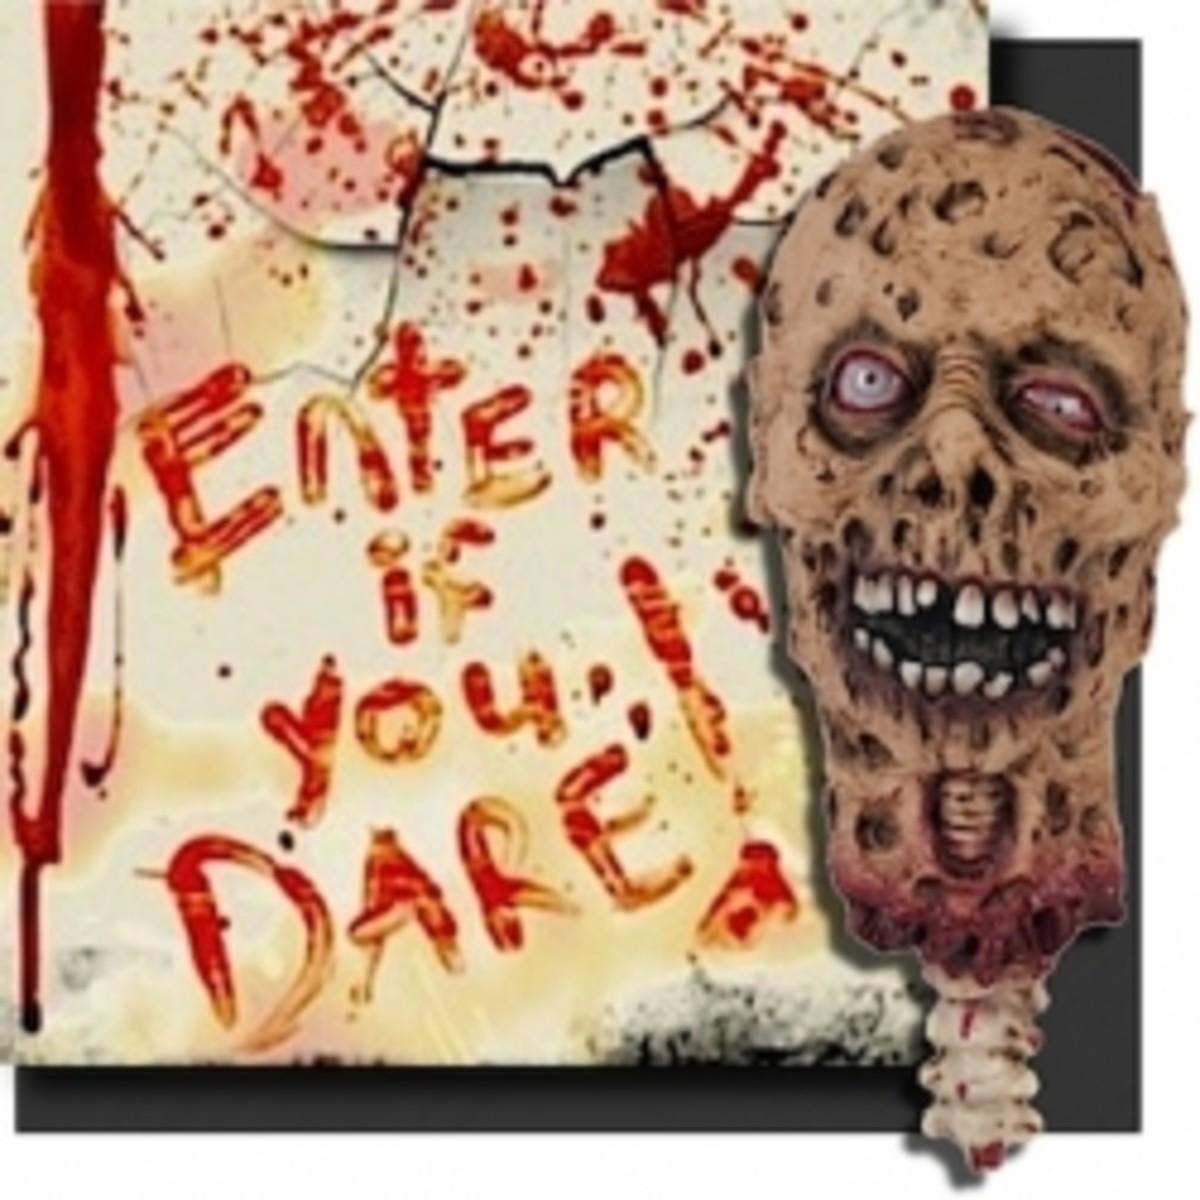 The Dark Side of Halloween: Disgusting Halloween Props